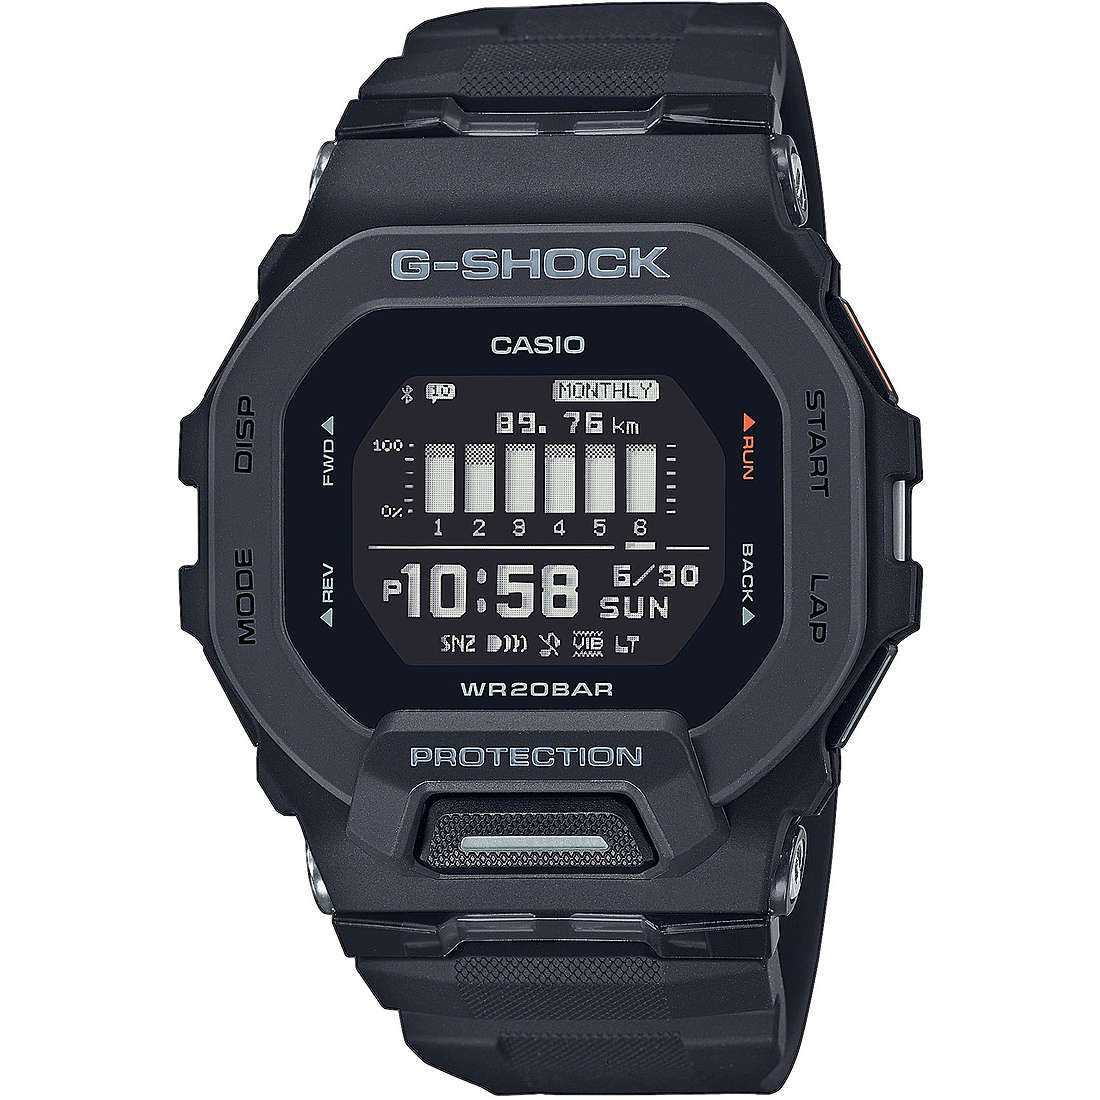 Orologio multifunzione uomo casio g shock g squad gbd 200 1er